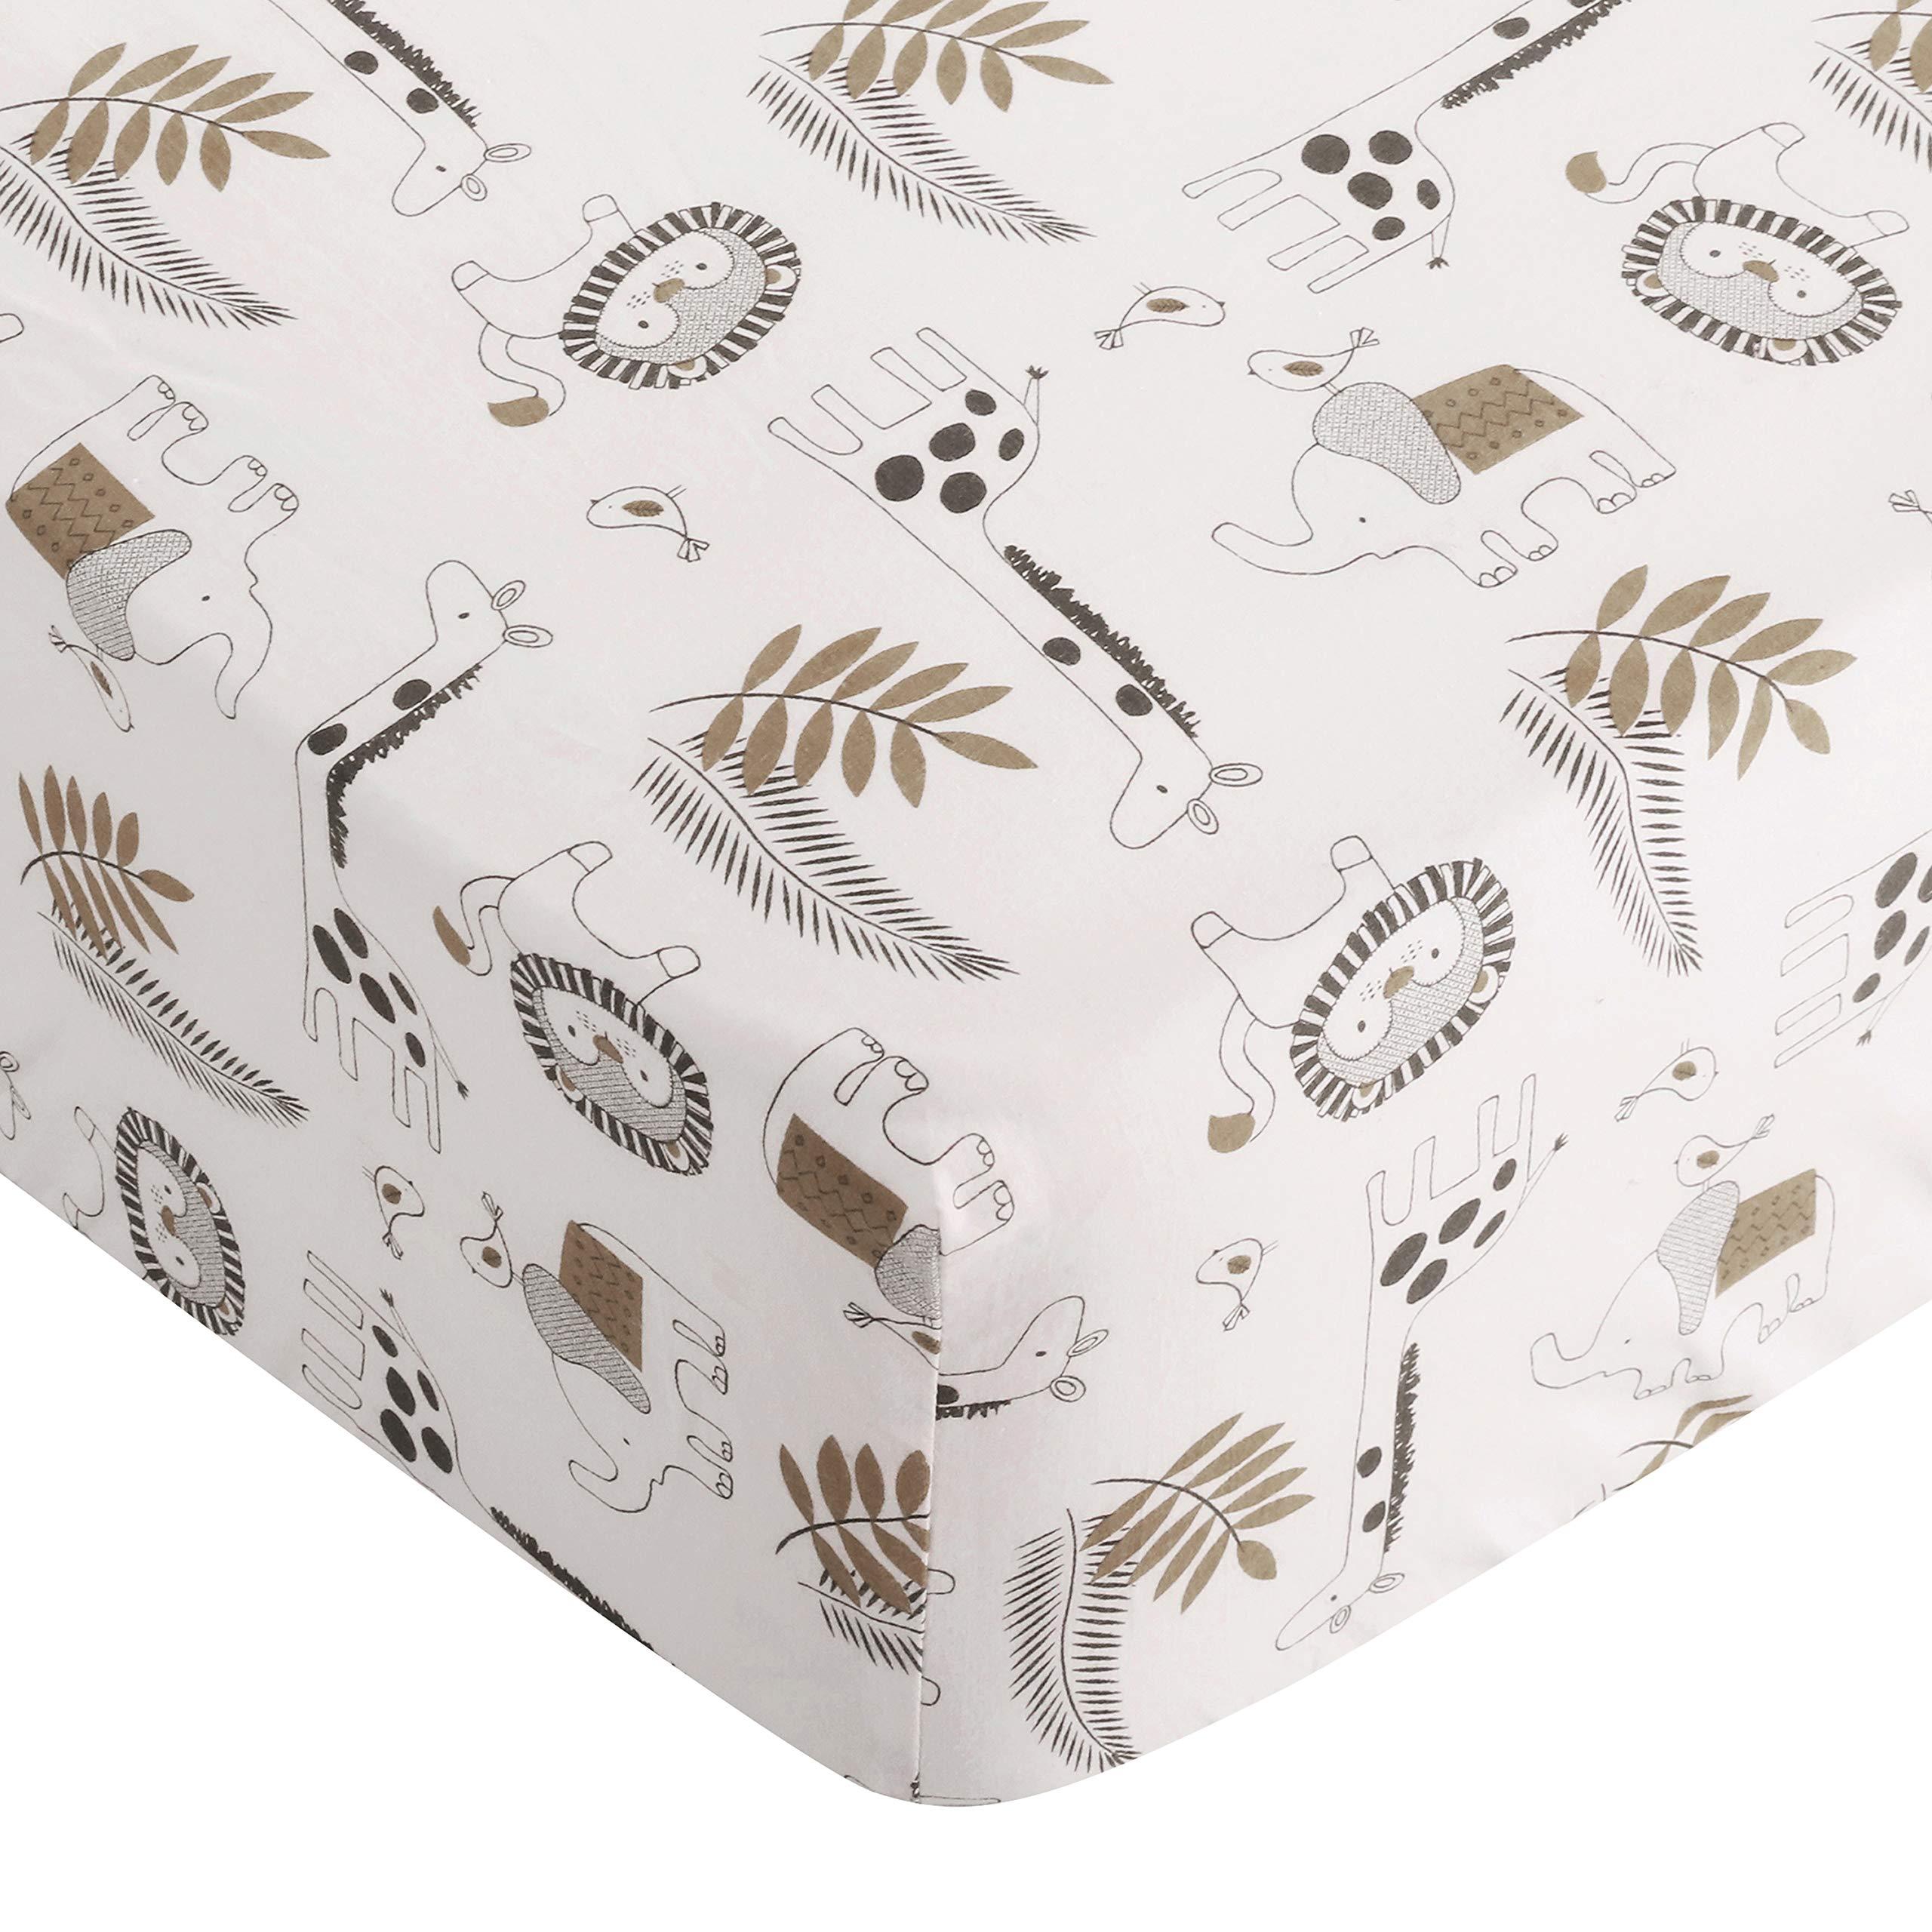 Levtex Baby Tanzania Neutral 5-Piece Crib Bedding Set, Grey/Black/Cream/Tan by Levtex (Image #3)